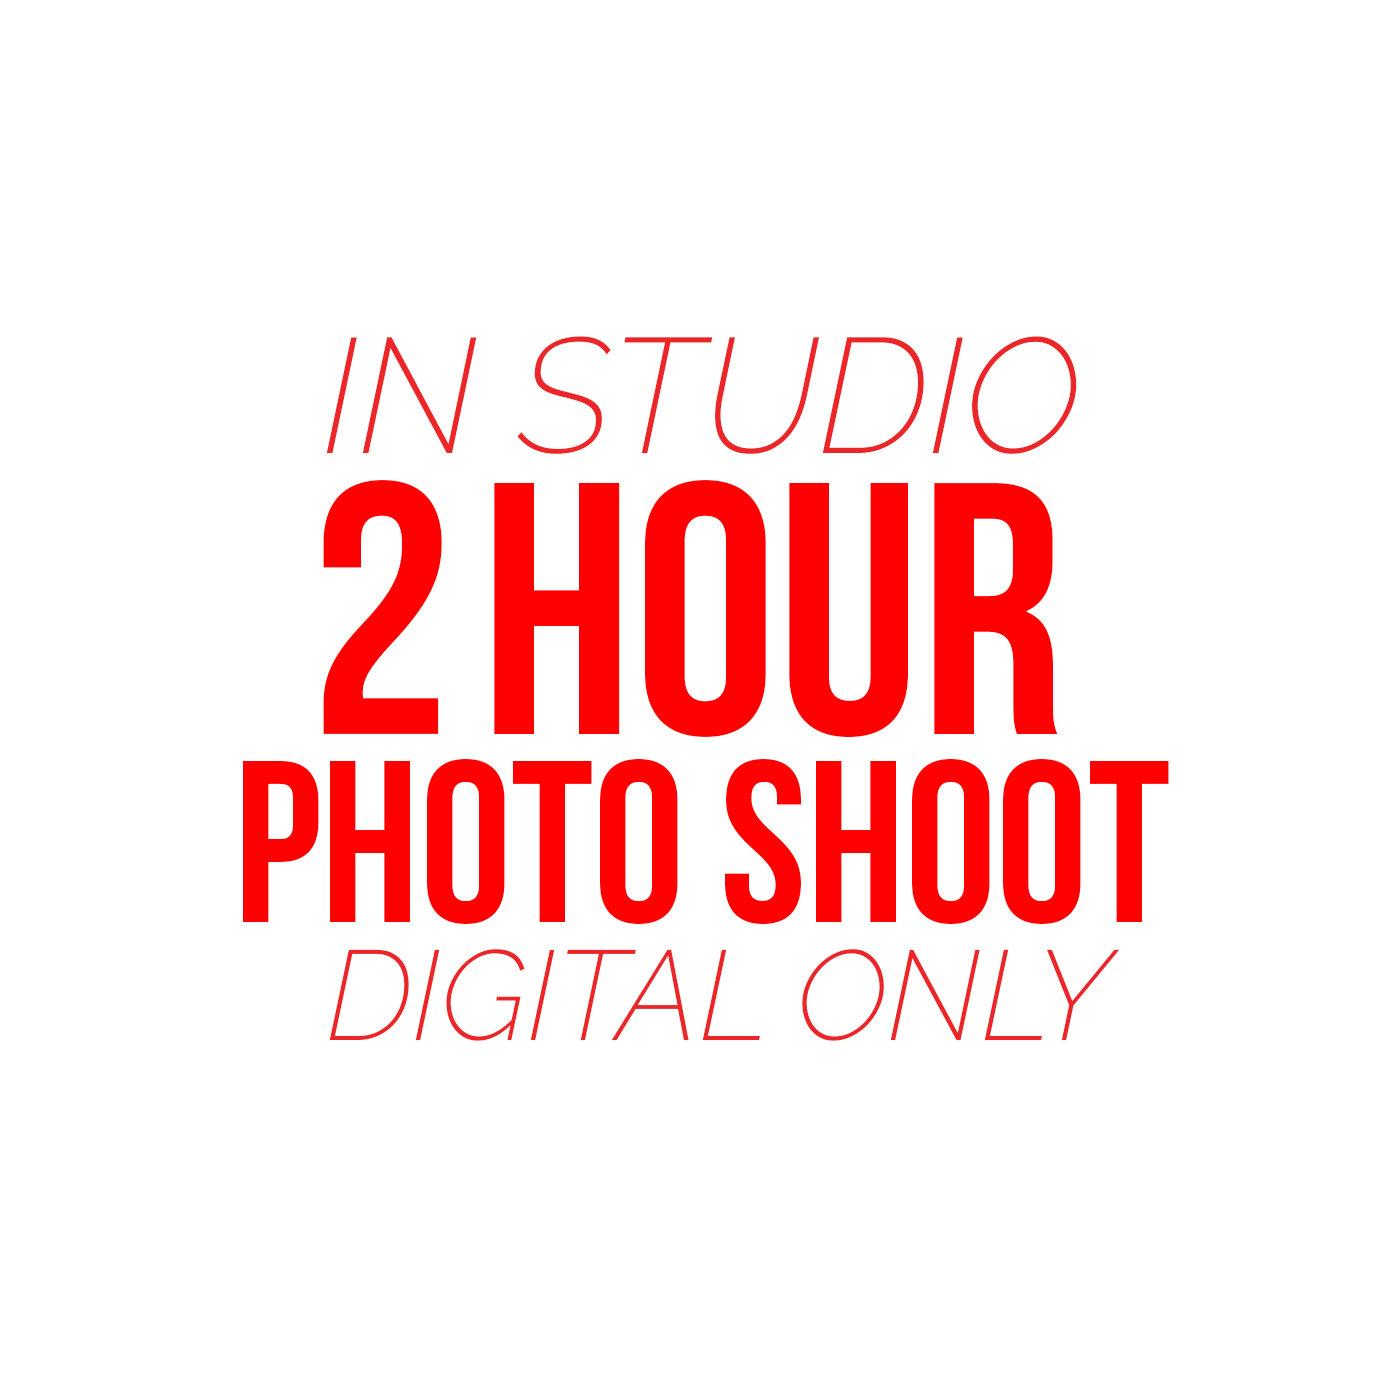 2 Hour Photo Shoot